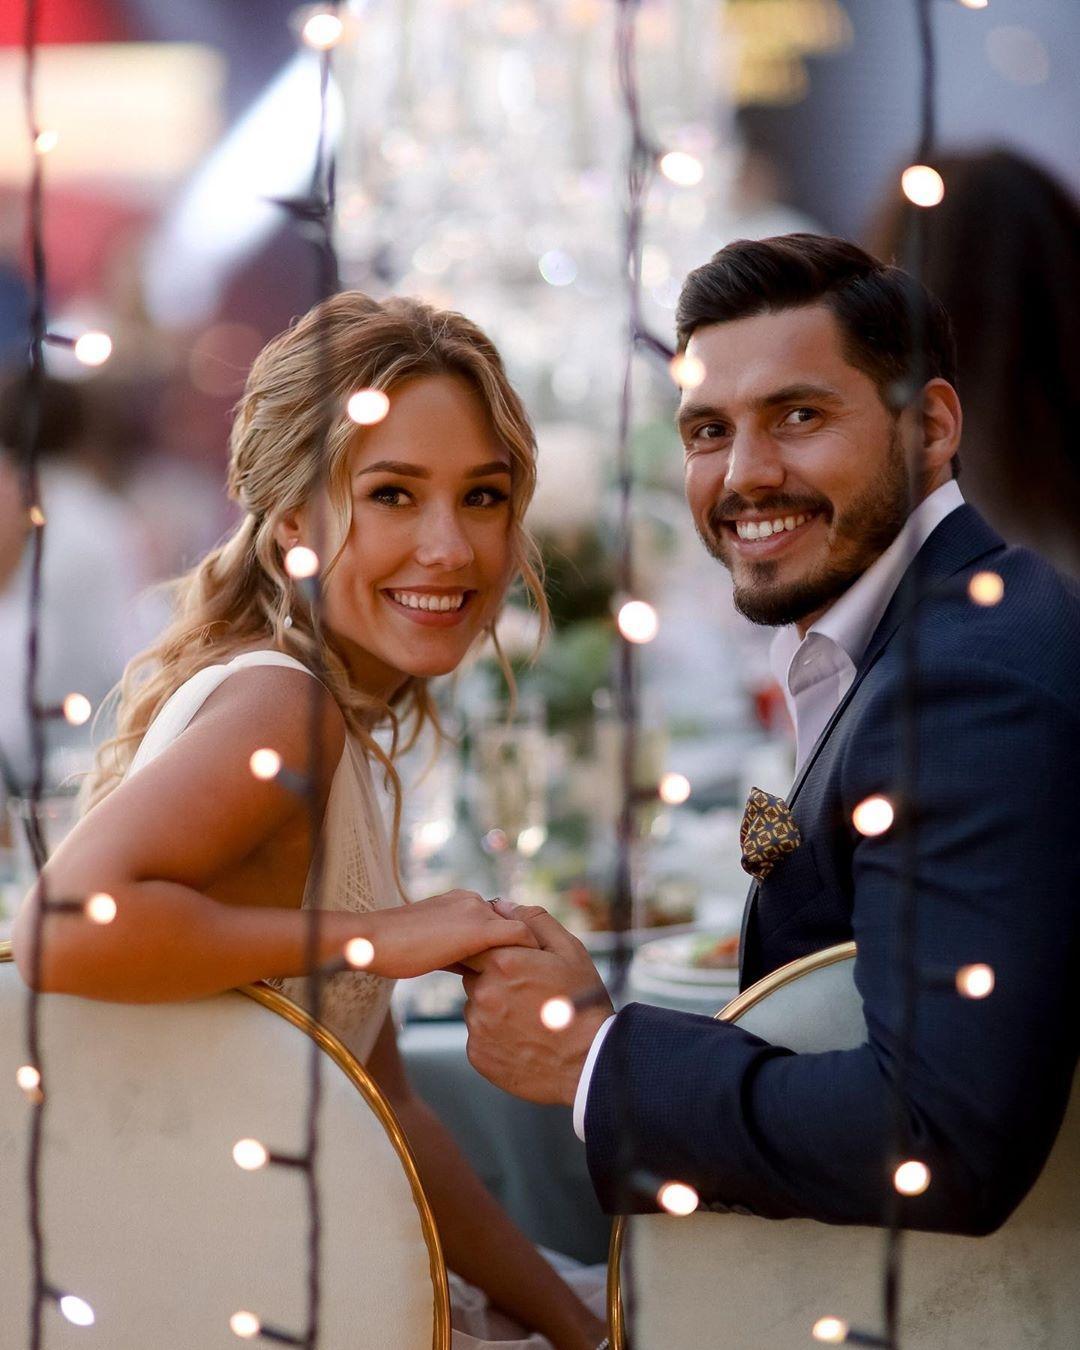 Никита Добрынин и Даша Квиткова свадьба